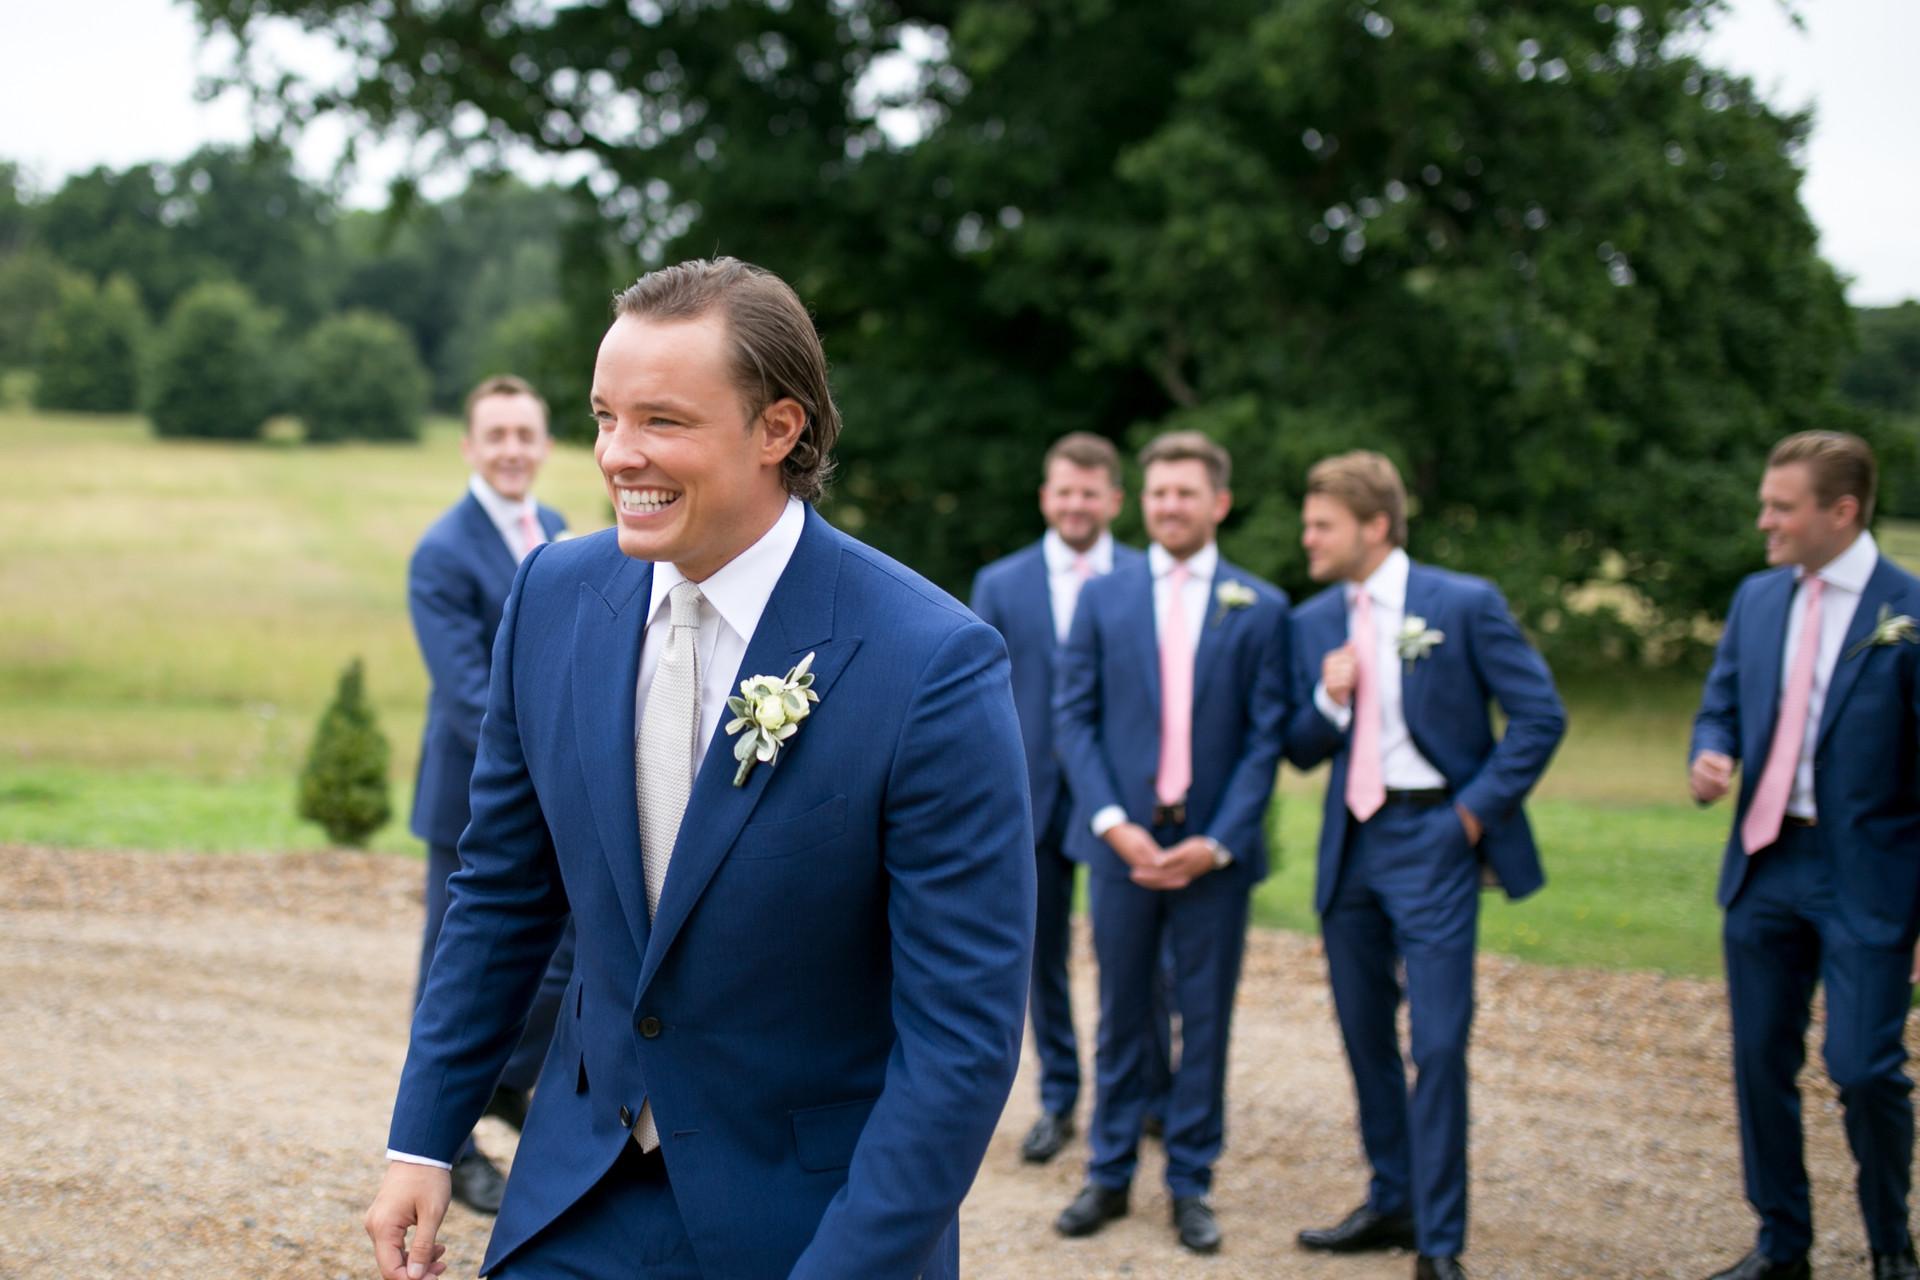 Brentwood Wedding Photographer. Essex Wedding Photographer. Ongar Wedding Photographer. East London Wedding Photographer. That Amazing Place. Stock Brook Wedding. That Amazing Place Wedding. Friern Manor. Lindrum Photography.